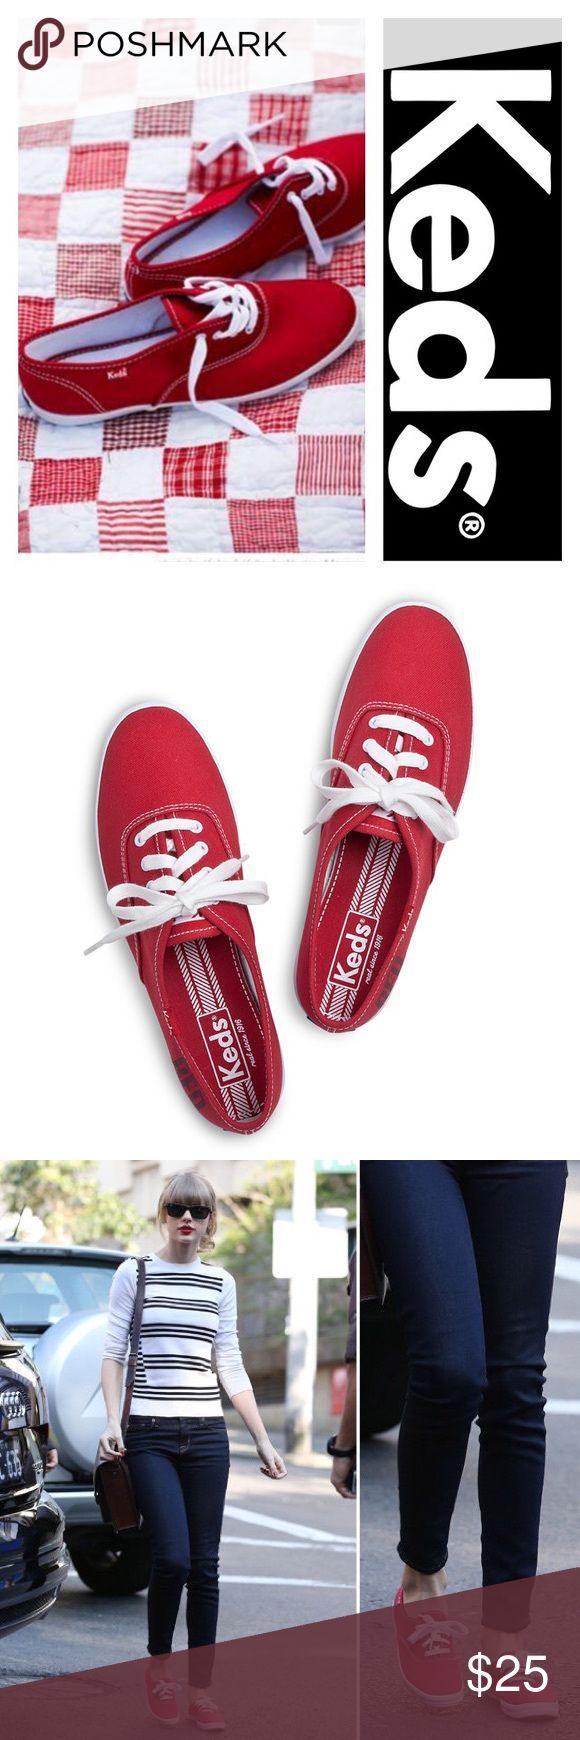 Selling this Keds Champion Originals [Red] on Poshmark! My username is: britt_popp. #shopmycloset #poshmark #fashion #shopping #style #forsale #Keds #Shoes